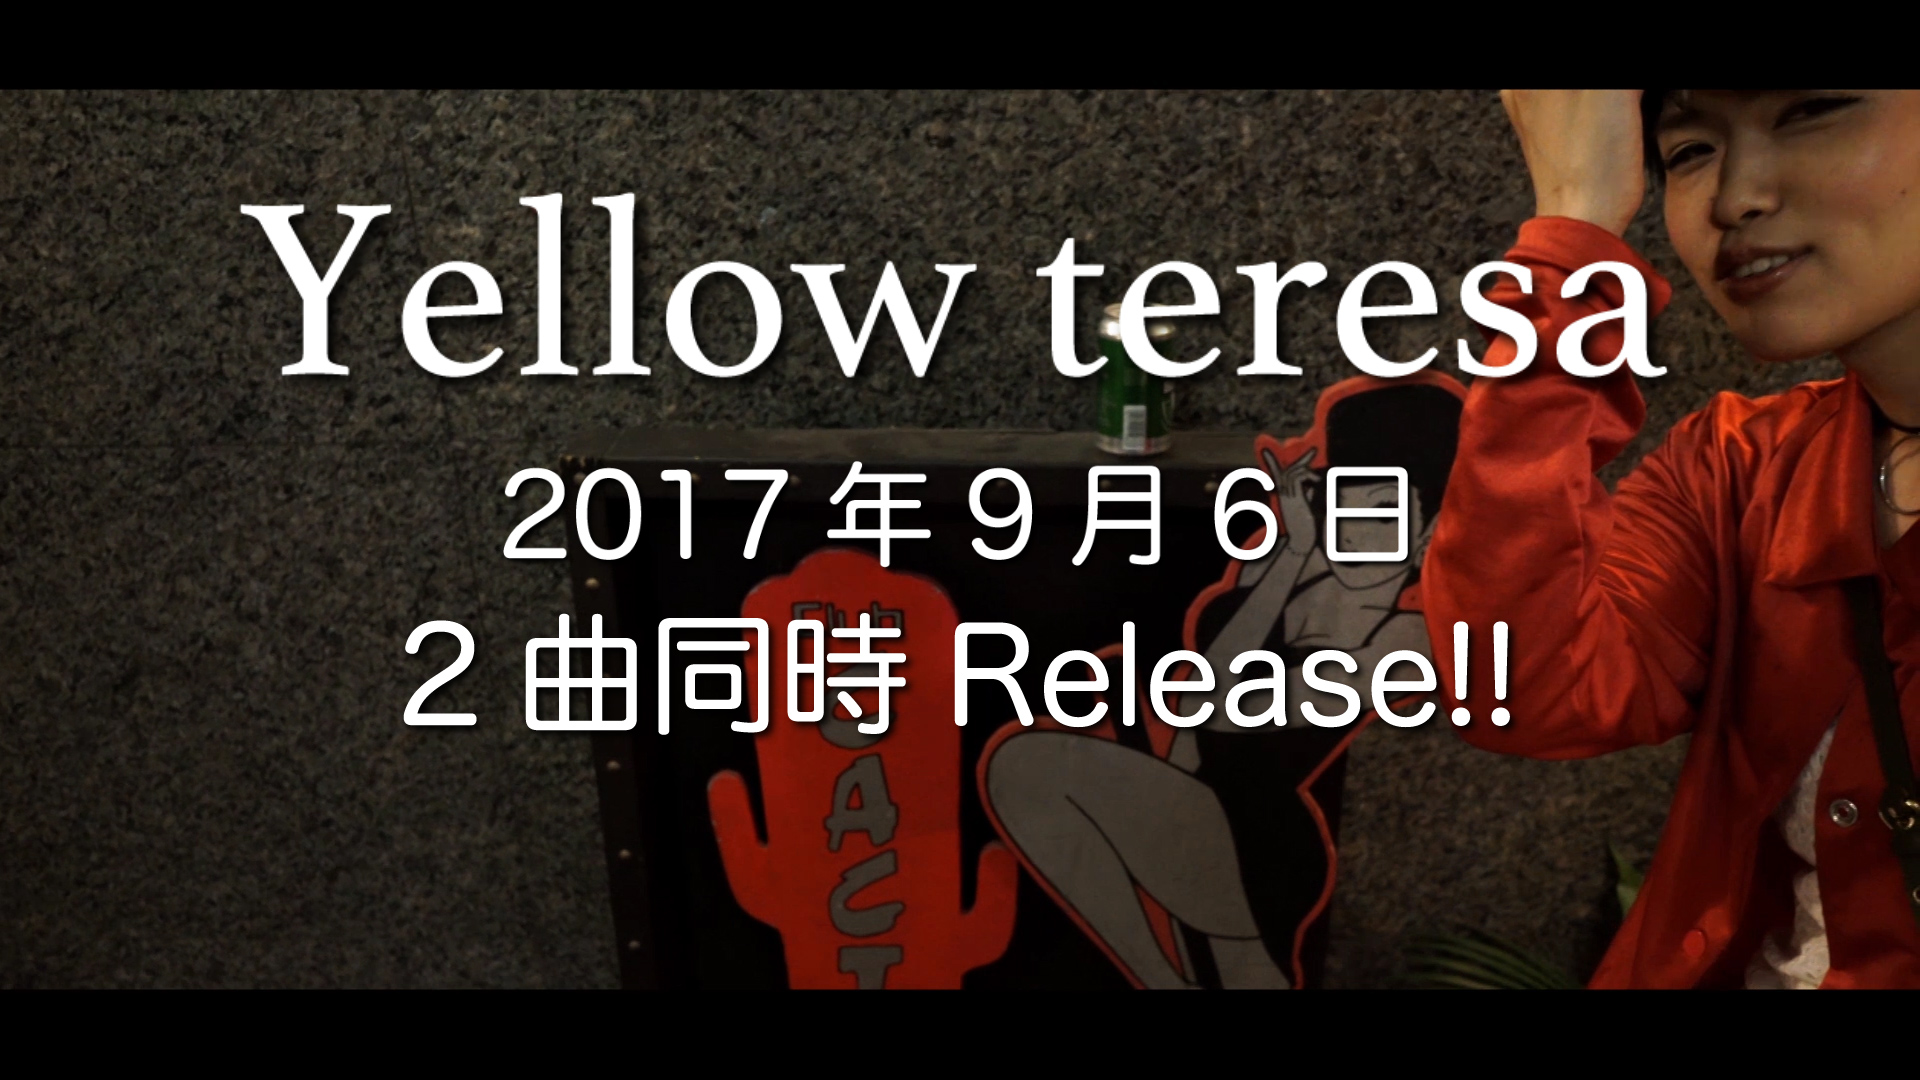 2017/9/6 yellow teresa 焼け石に水PRODUCTIONより2曲同時リリース♫